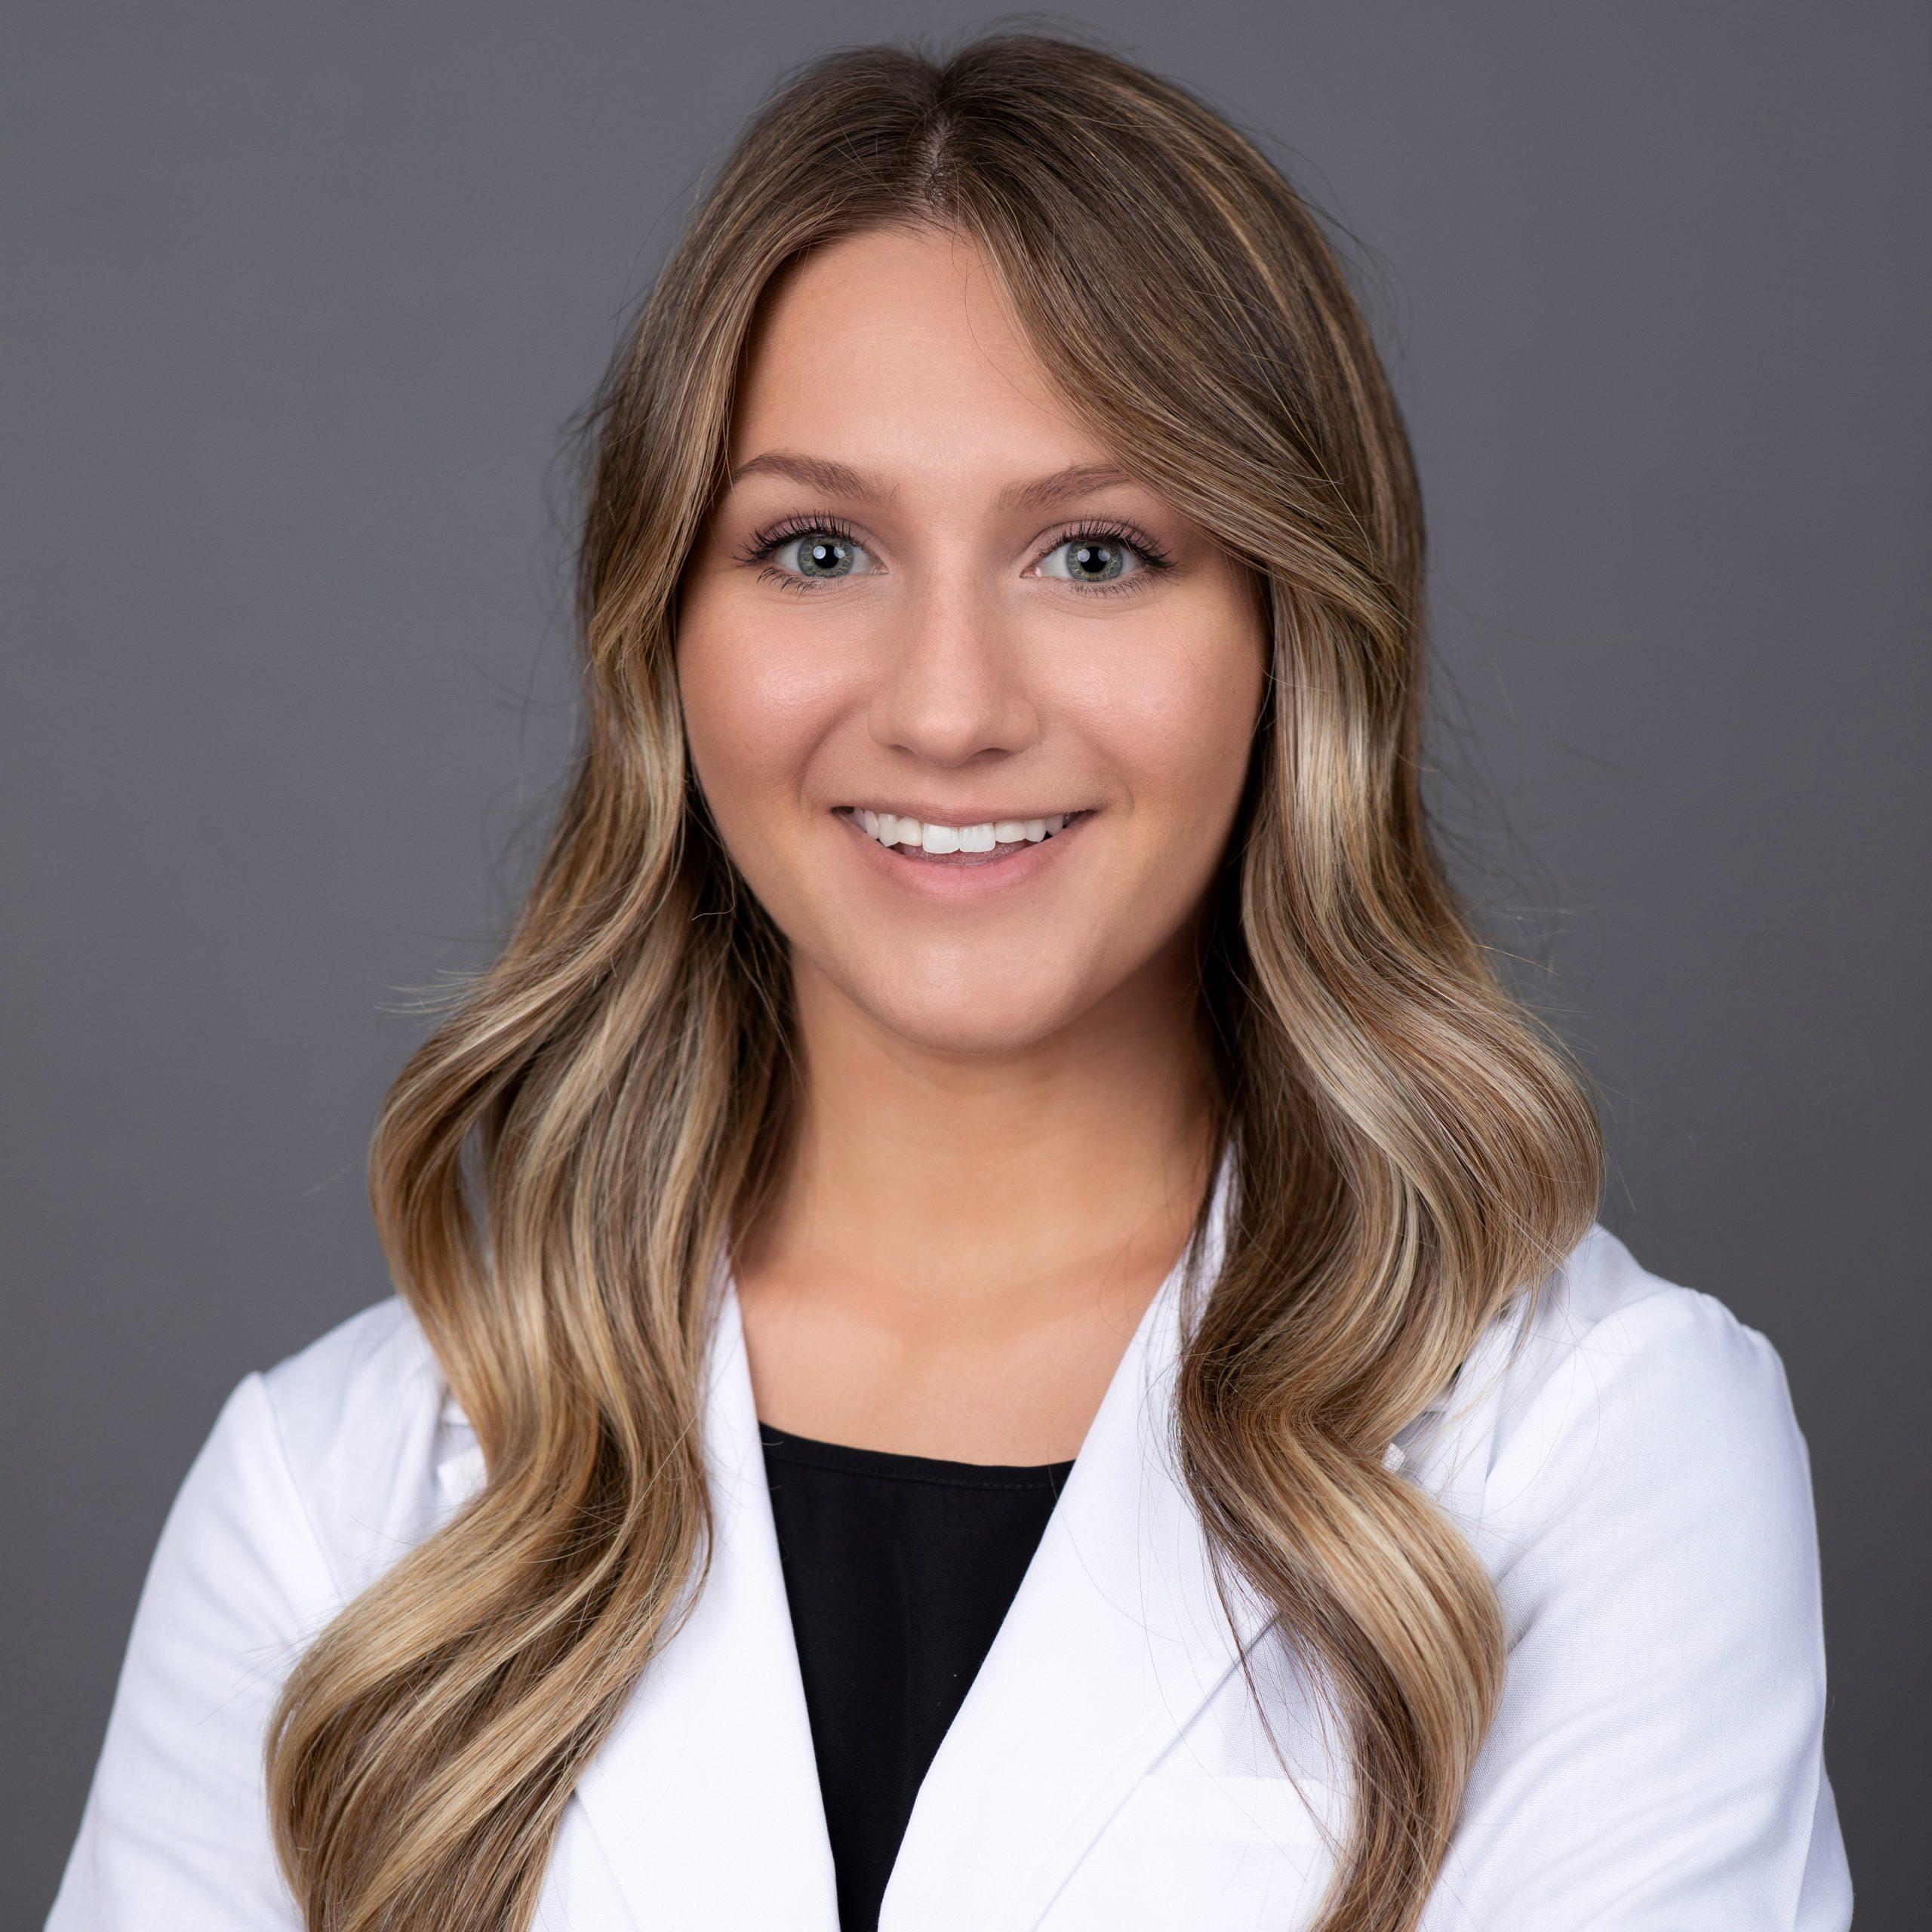 Dr. Megan Sales, Shopko Optical Optometrist